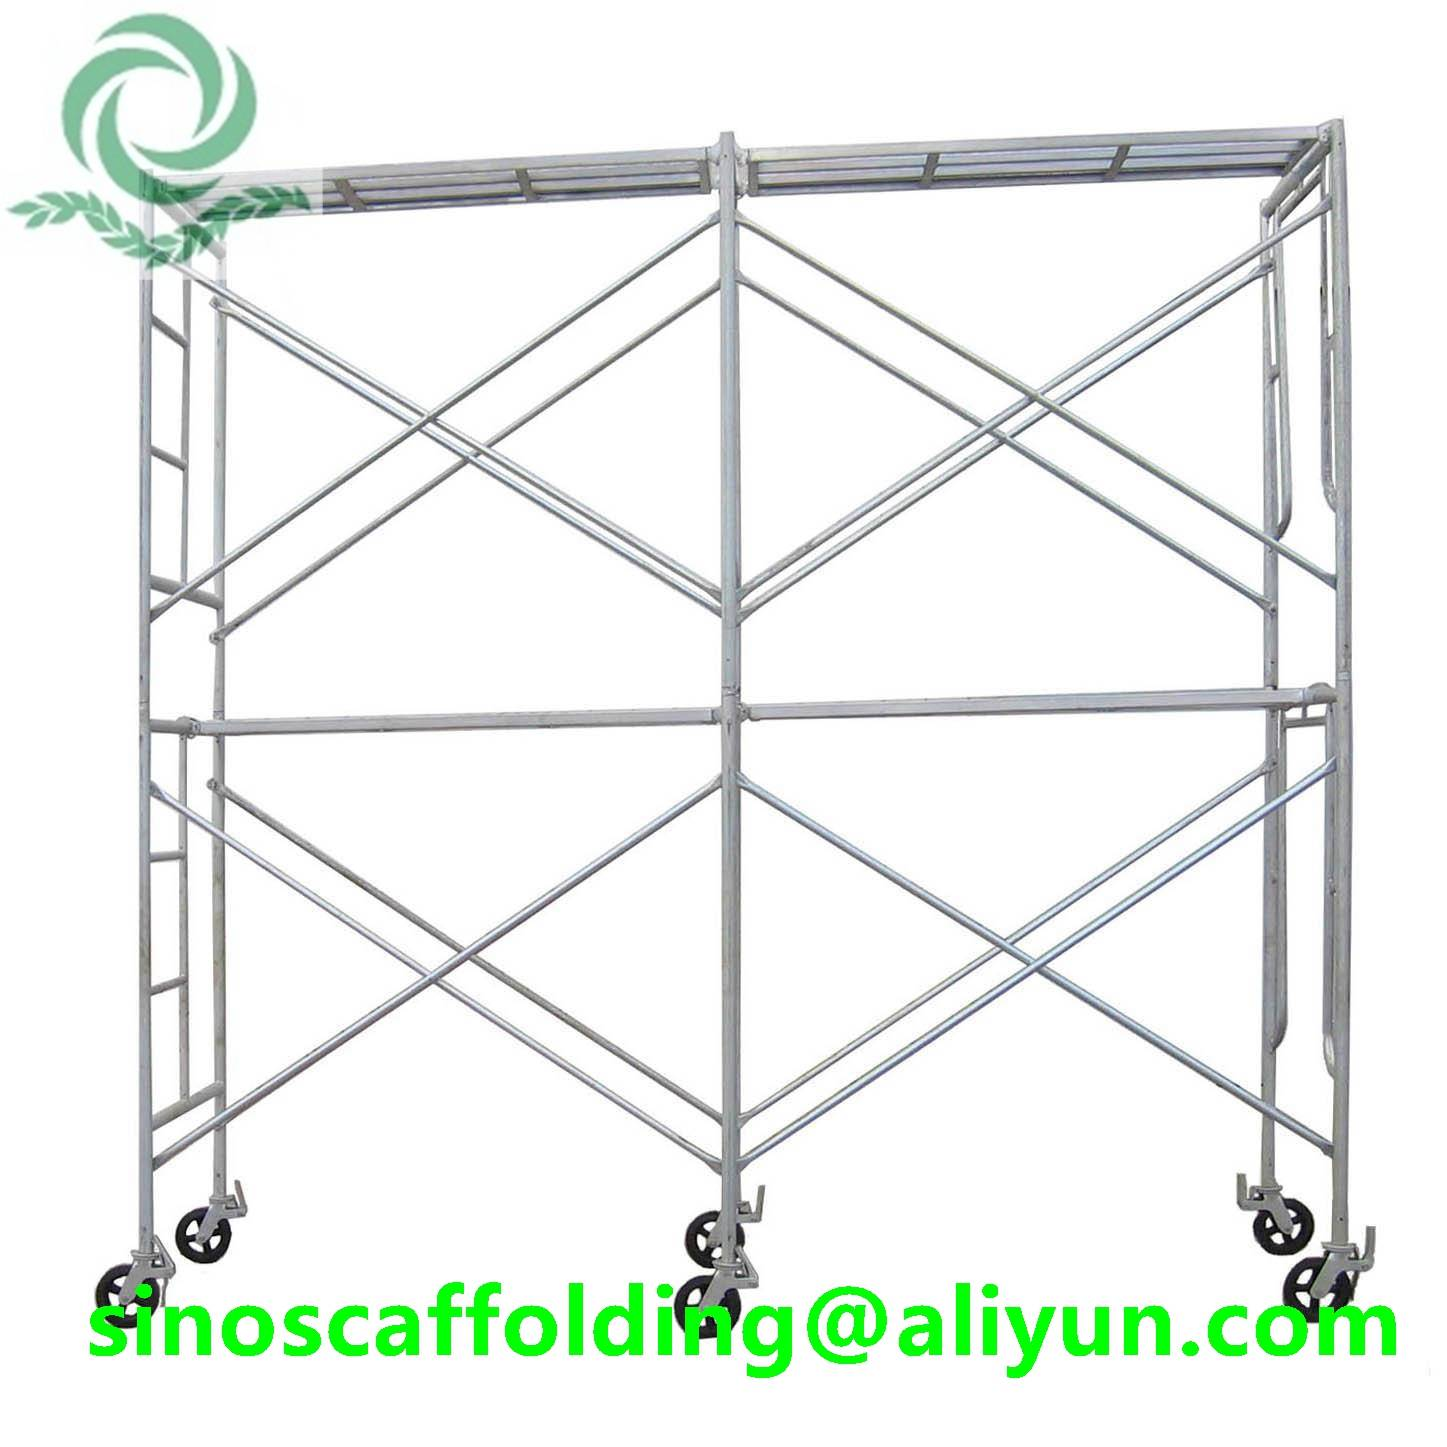 Scaffolding Steel Frame  System